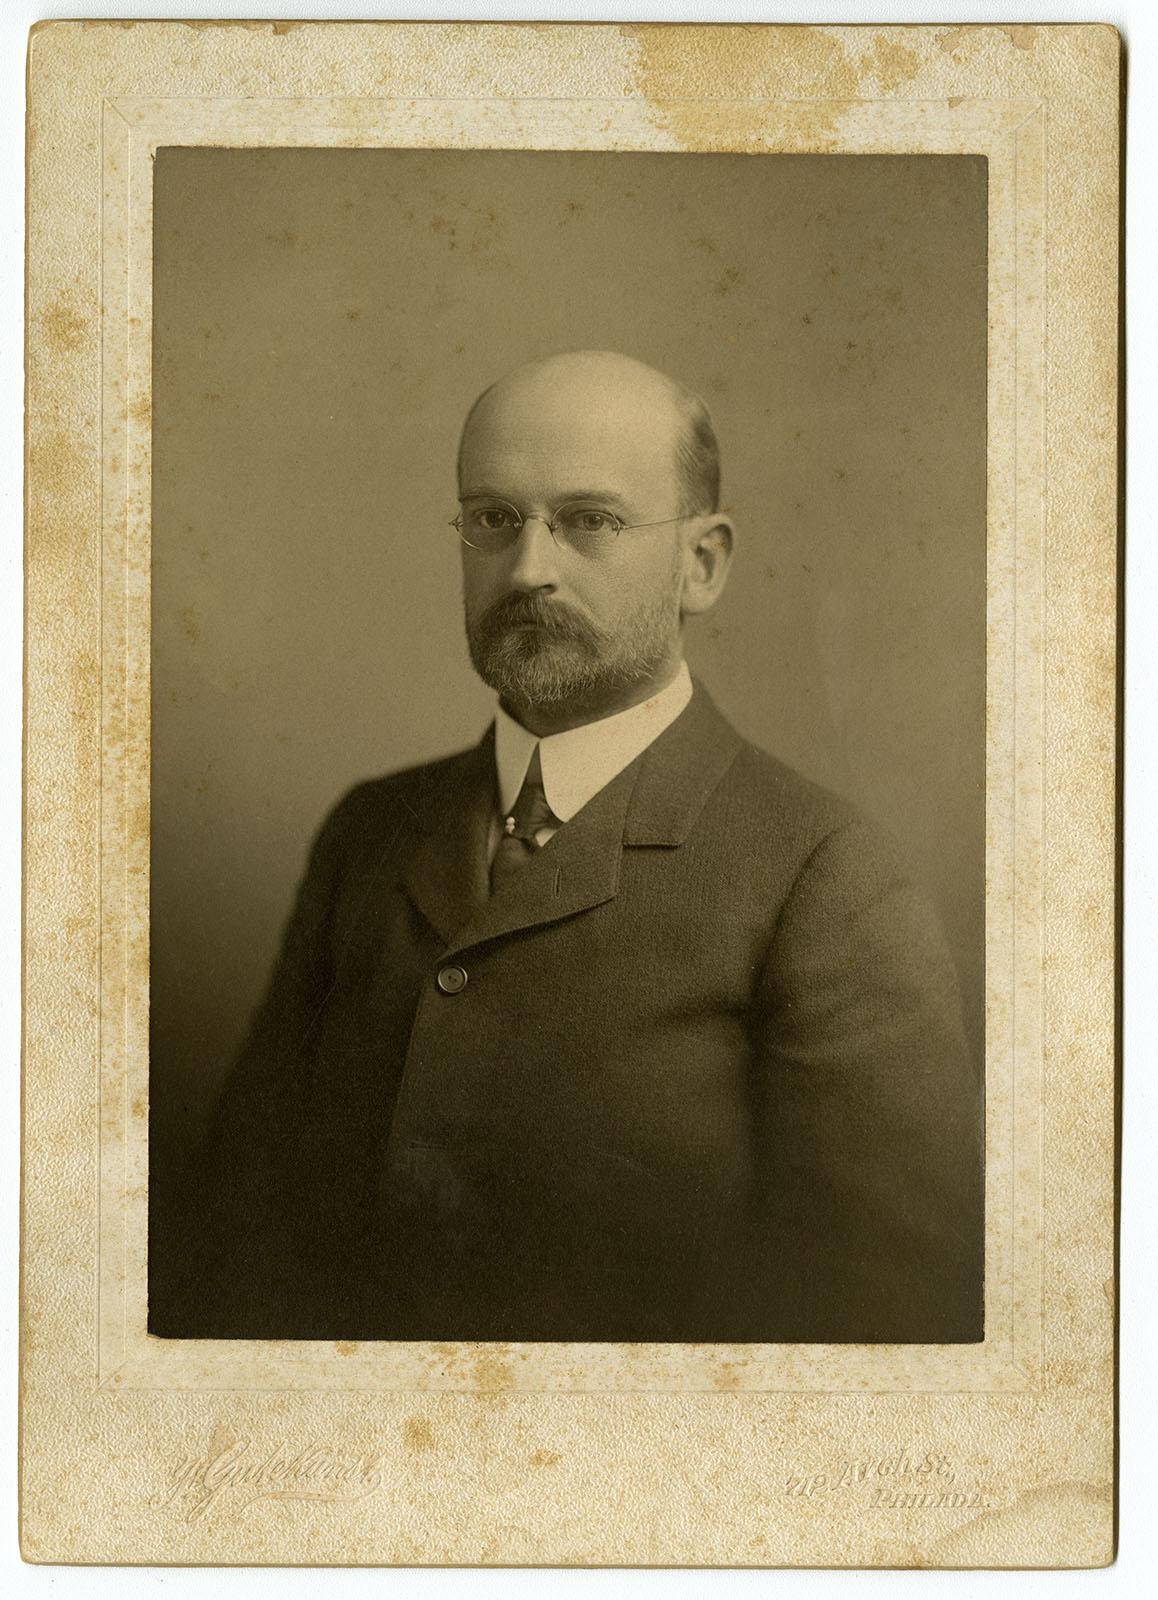 Frederick Gutekunst, William J. Taylor. (Philadelphia, ca. 1905). Albumen print cabinet card. Loan courtesy of the Historical Society of Pennsylvania.